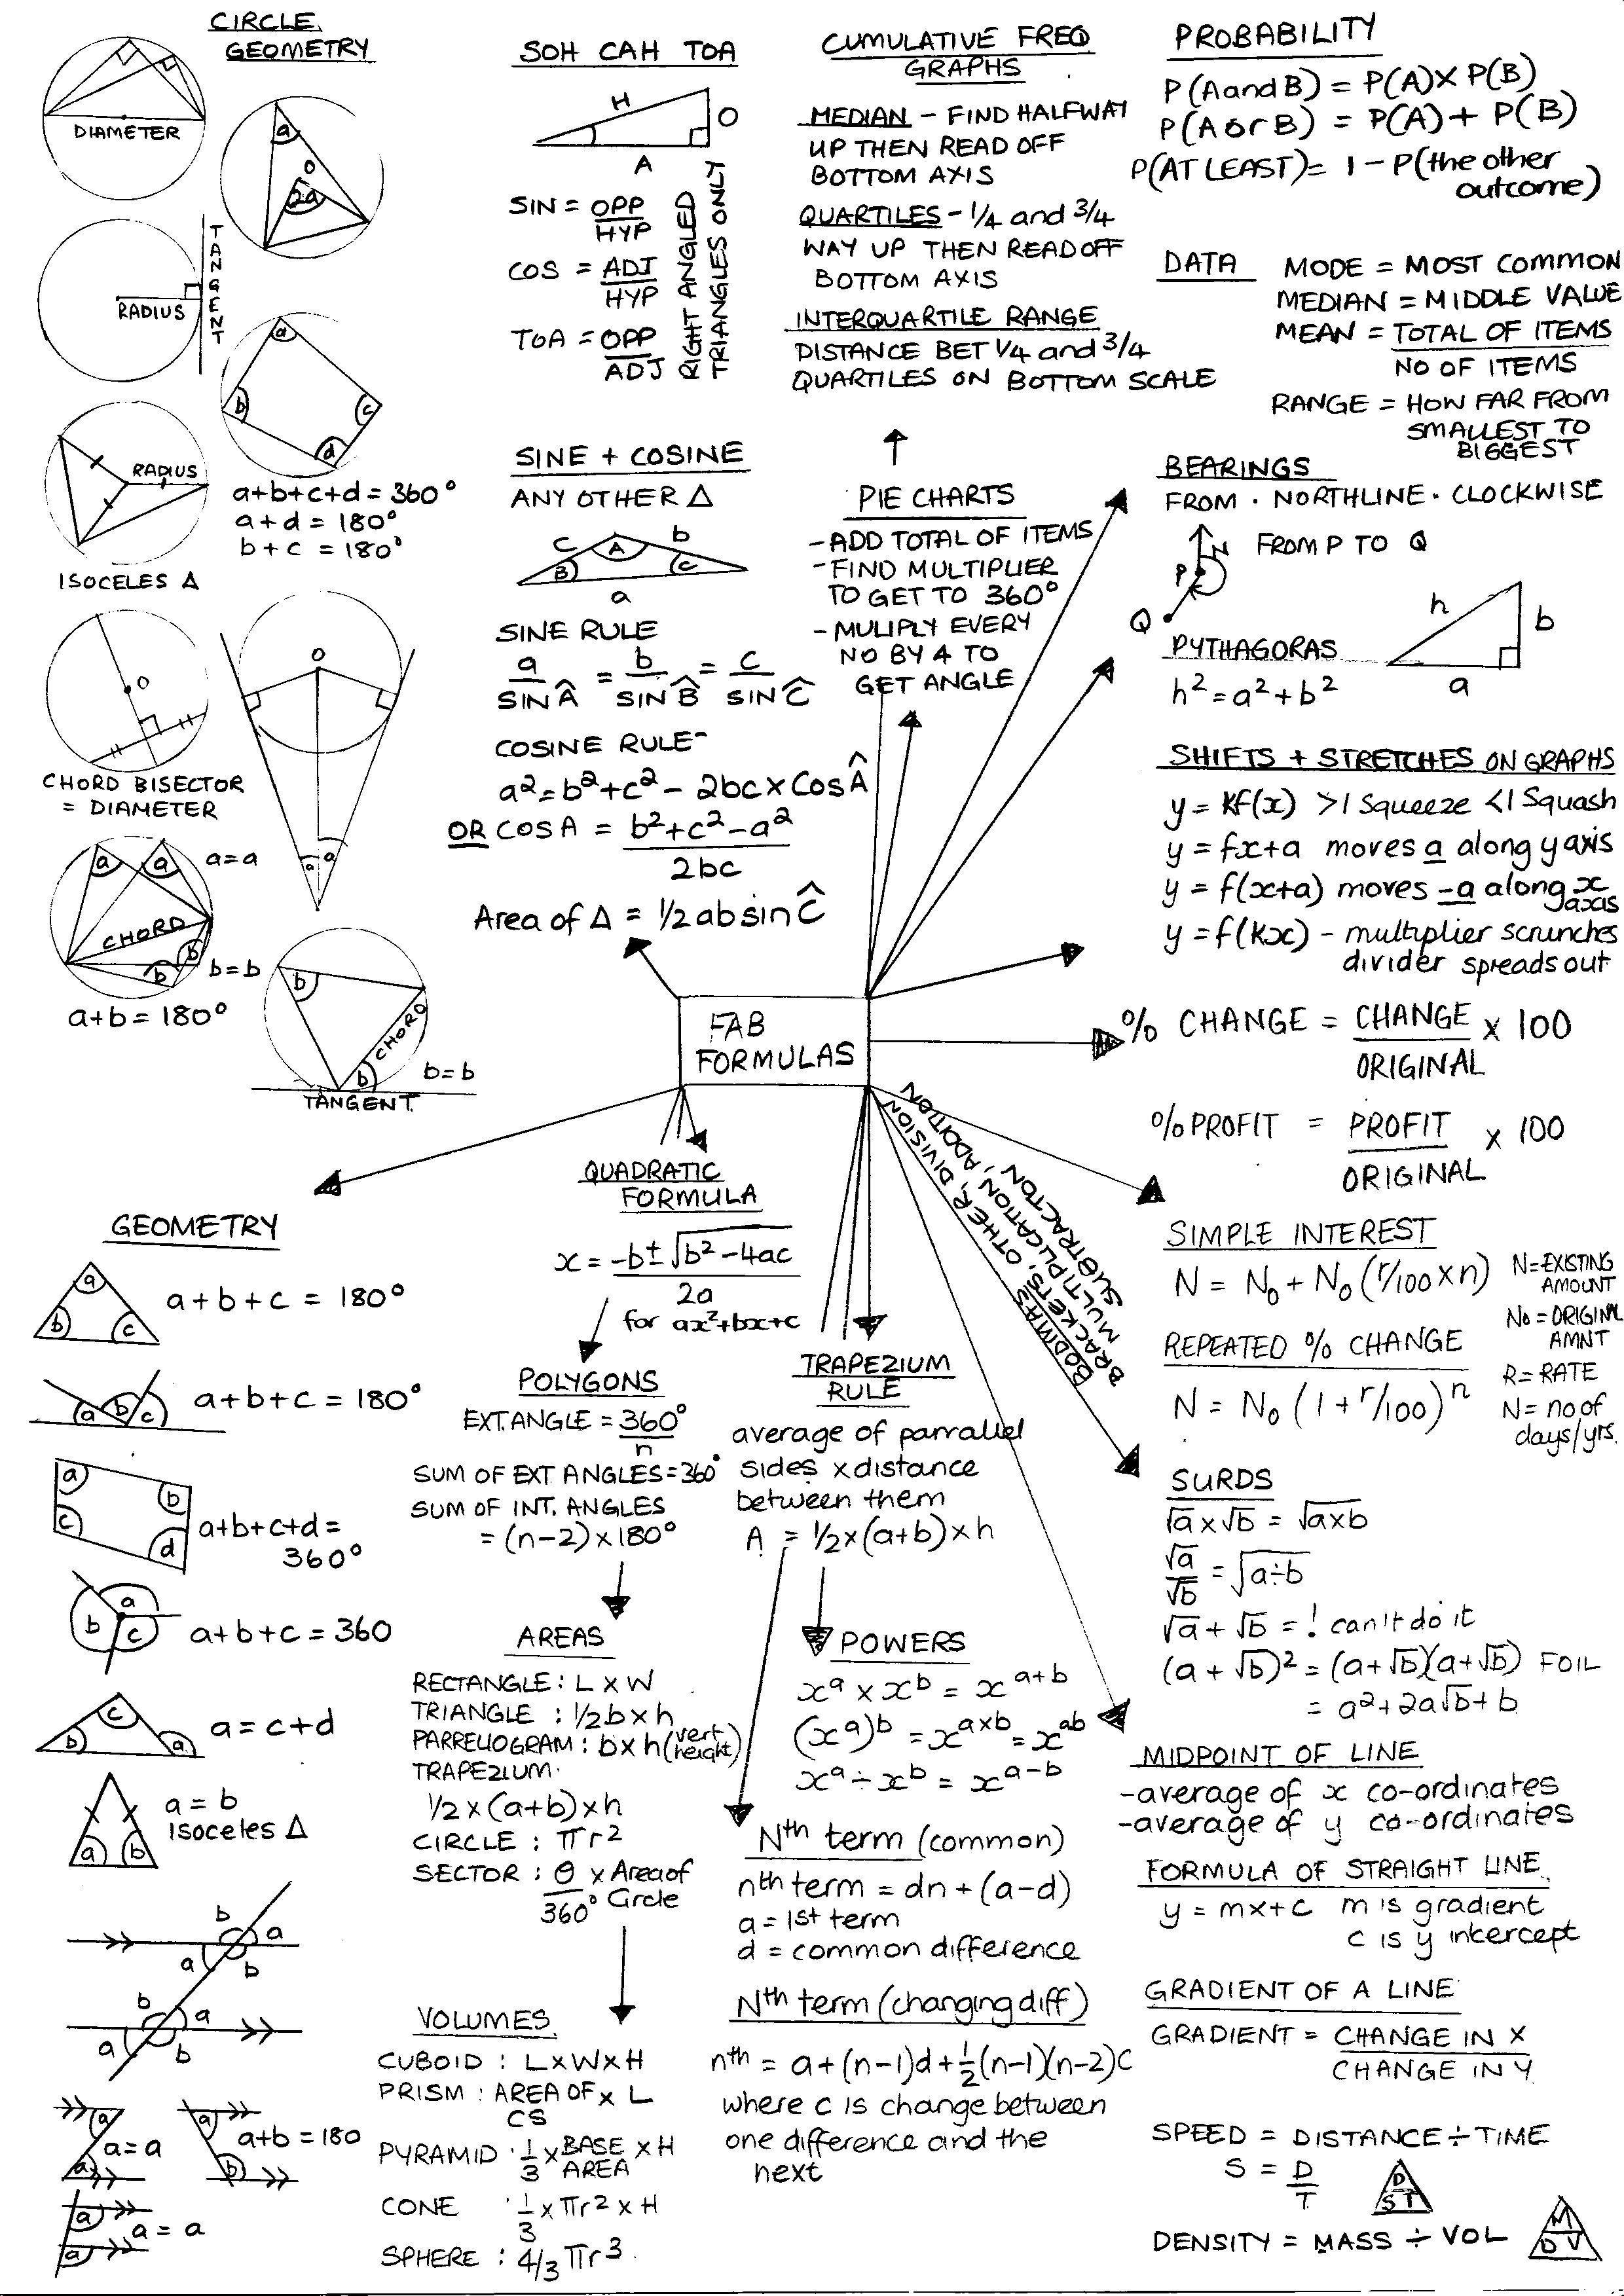 Gcse Maths Revision Resources Gcse Revision Revision Guides And Math